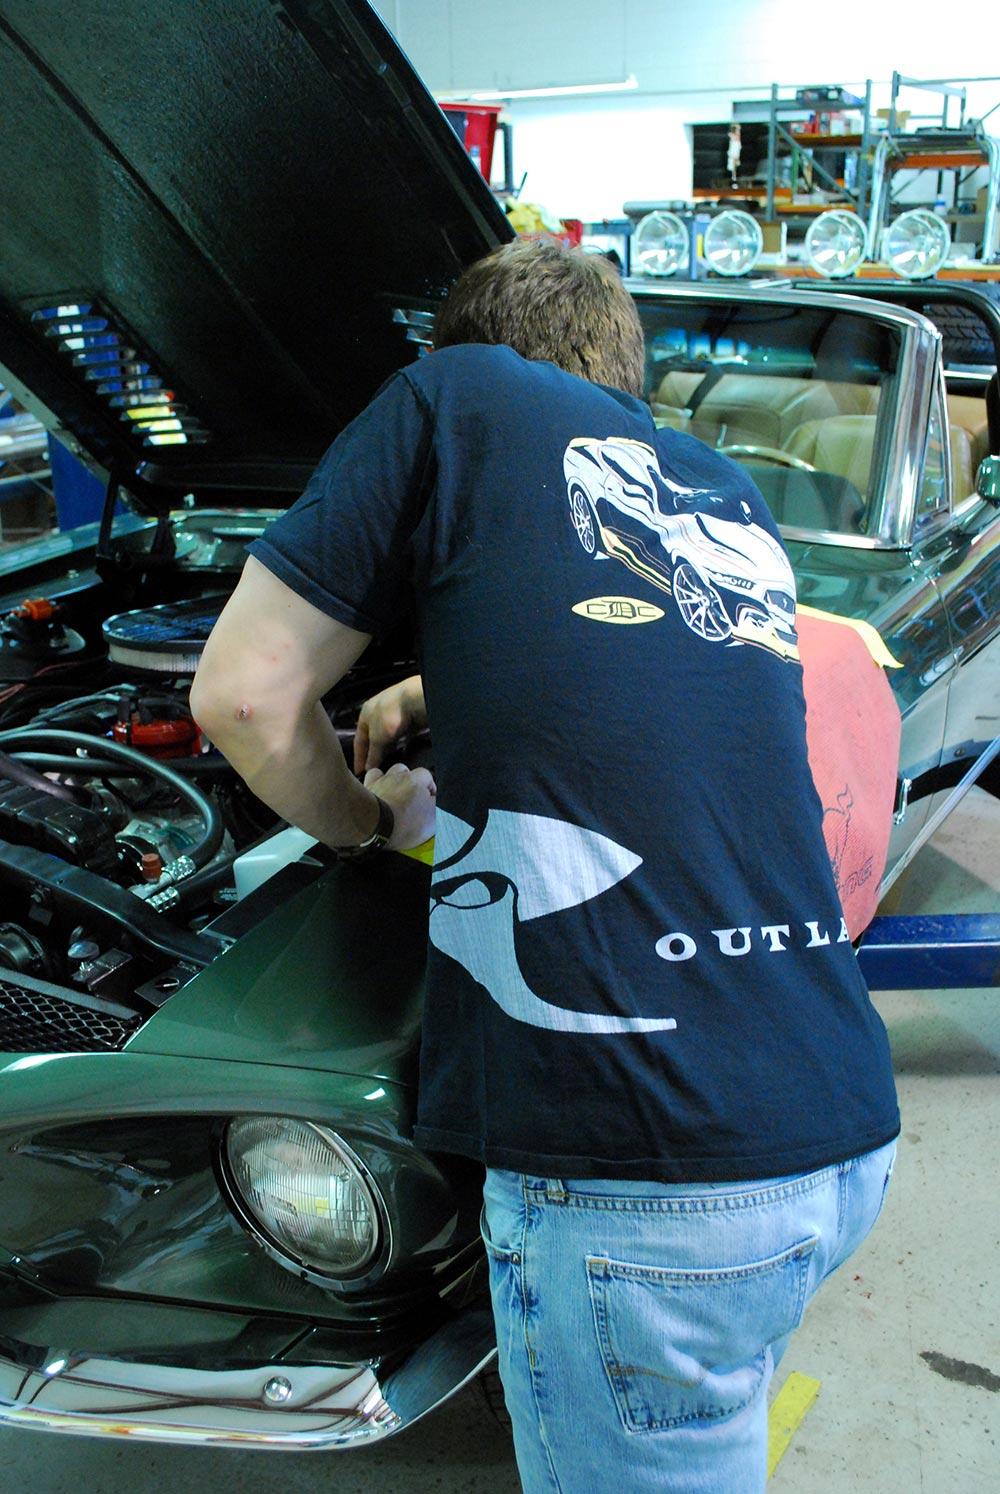 outlaw-shirt-3.jpg